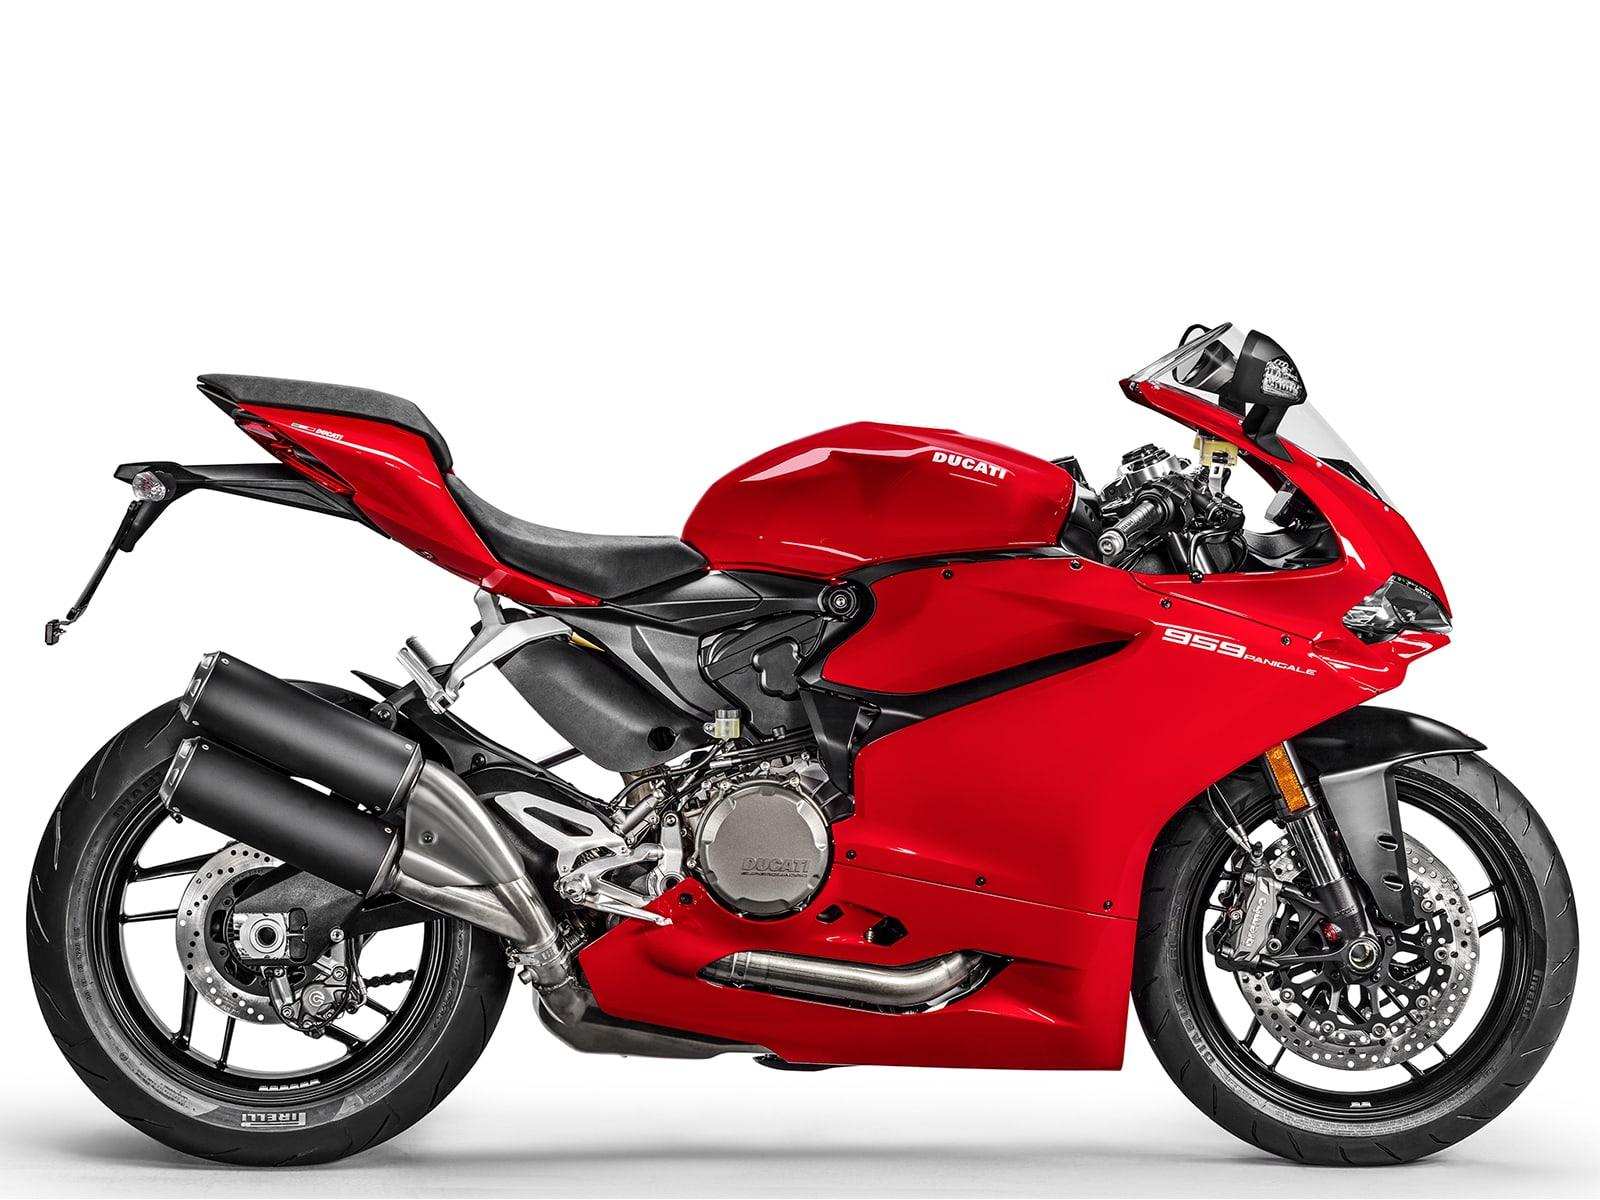 Мотоцикл DUCATI 959 Panigale - Ducati Red (2019)